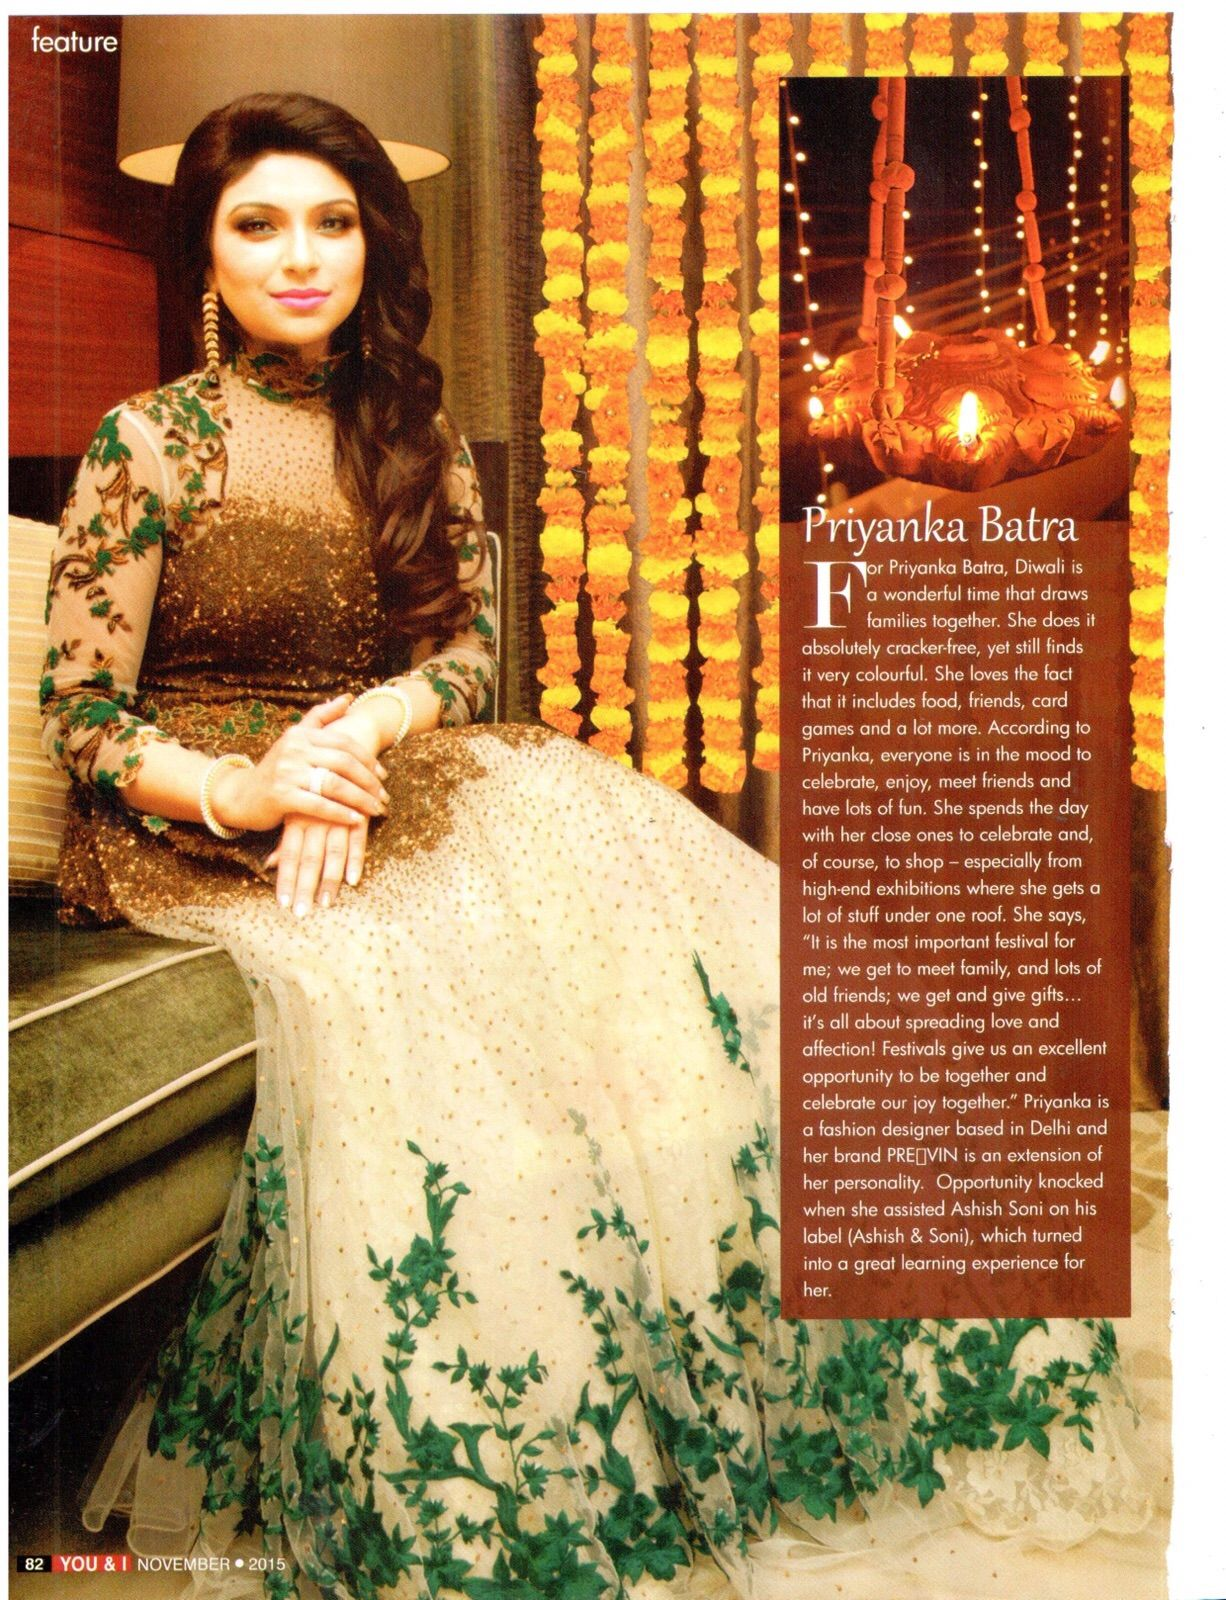 Preevin's Super Stylish & Elegant Designer, Priyanka Batra talks all about Diwali in this special festive feature for You & I Magazine.  #Preevin #Delhi #Fashion #Designer #PriyankaBatra